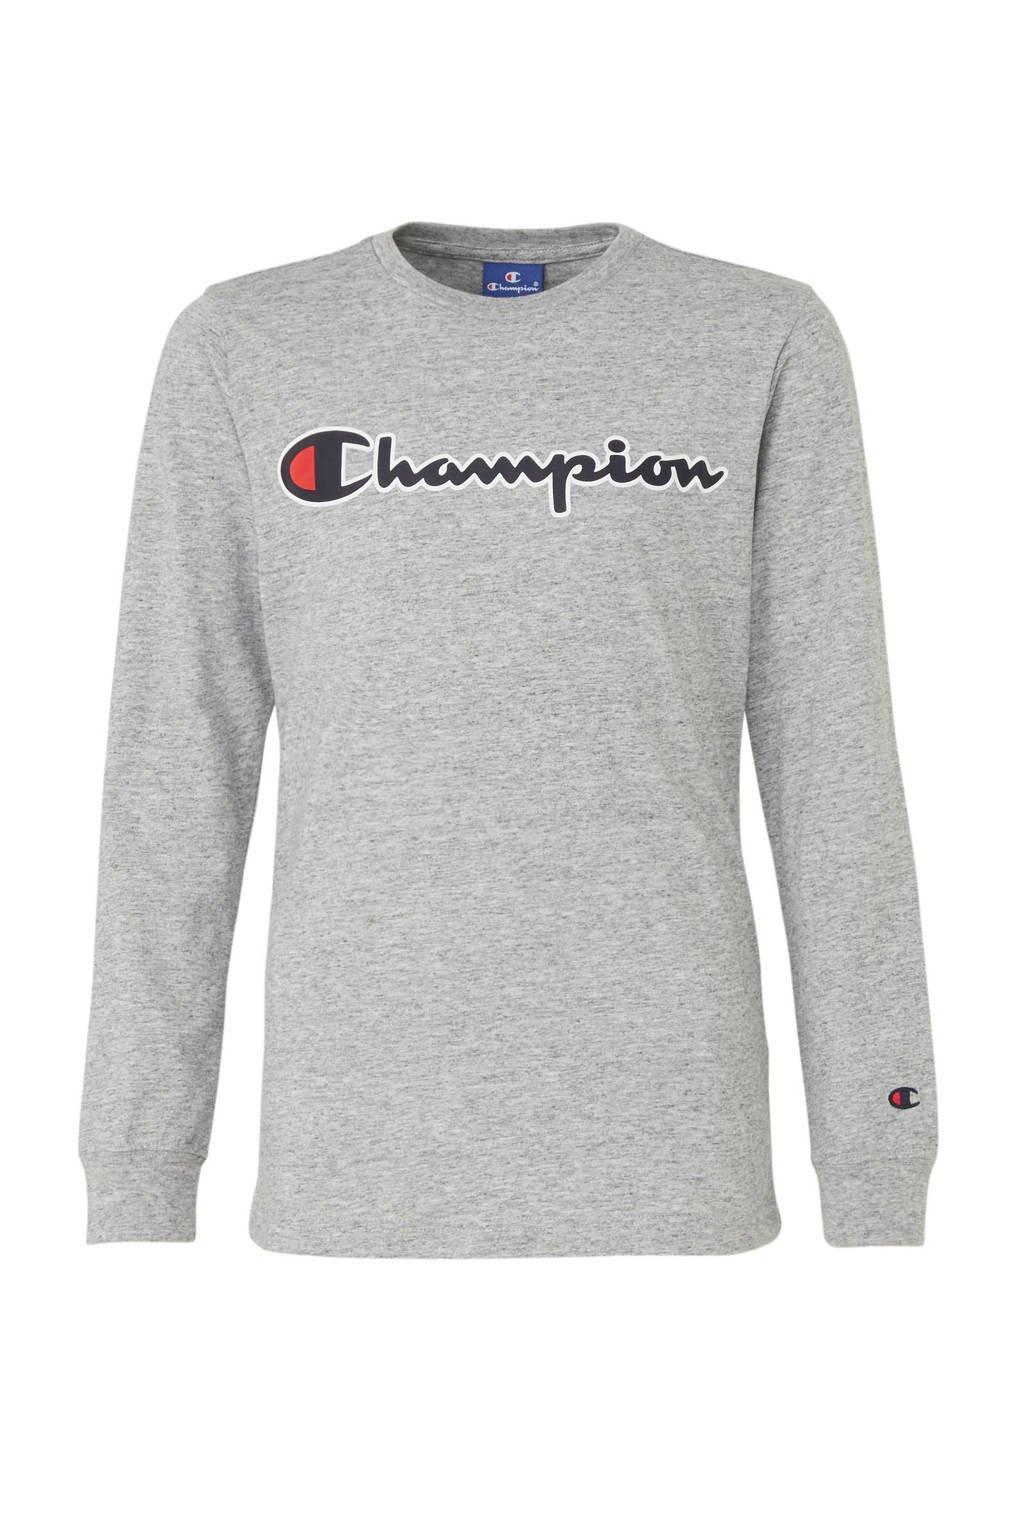 Champion longsleeve met logo grijs melange, Grijs melange